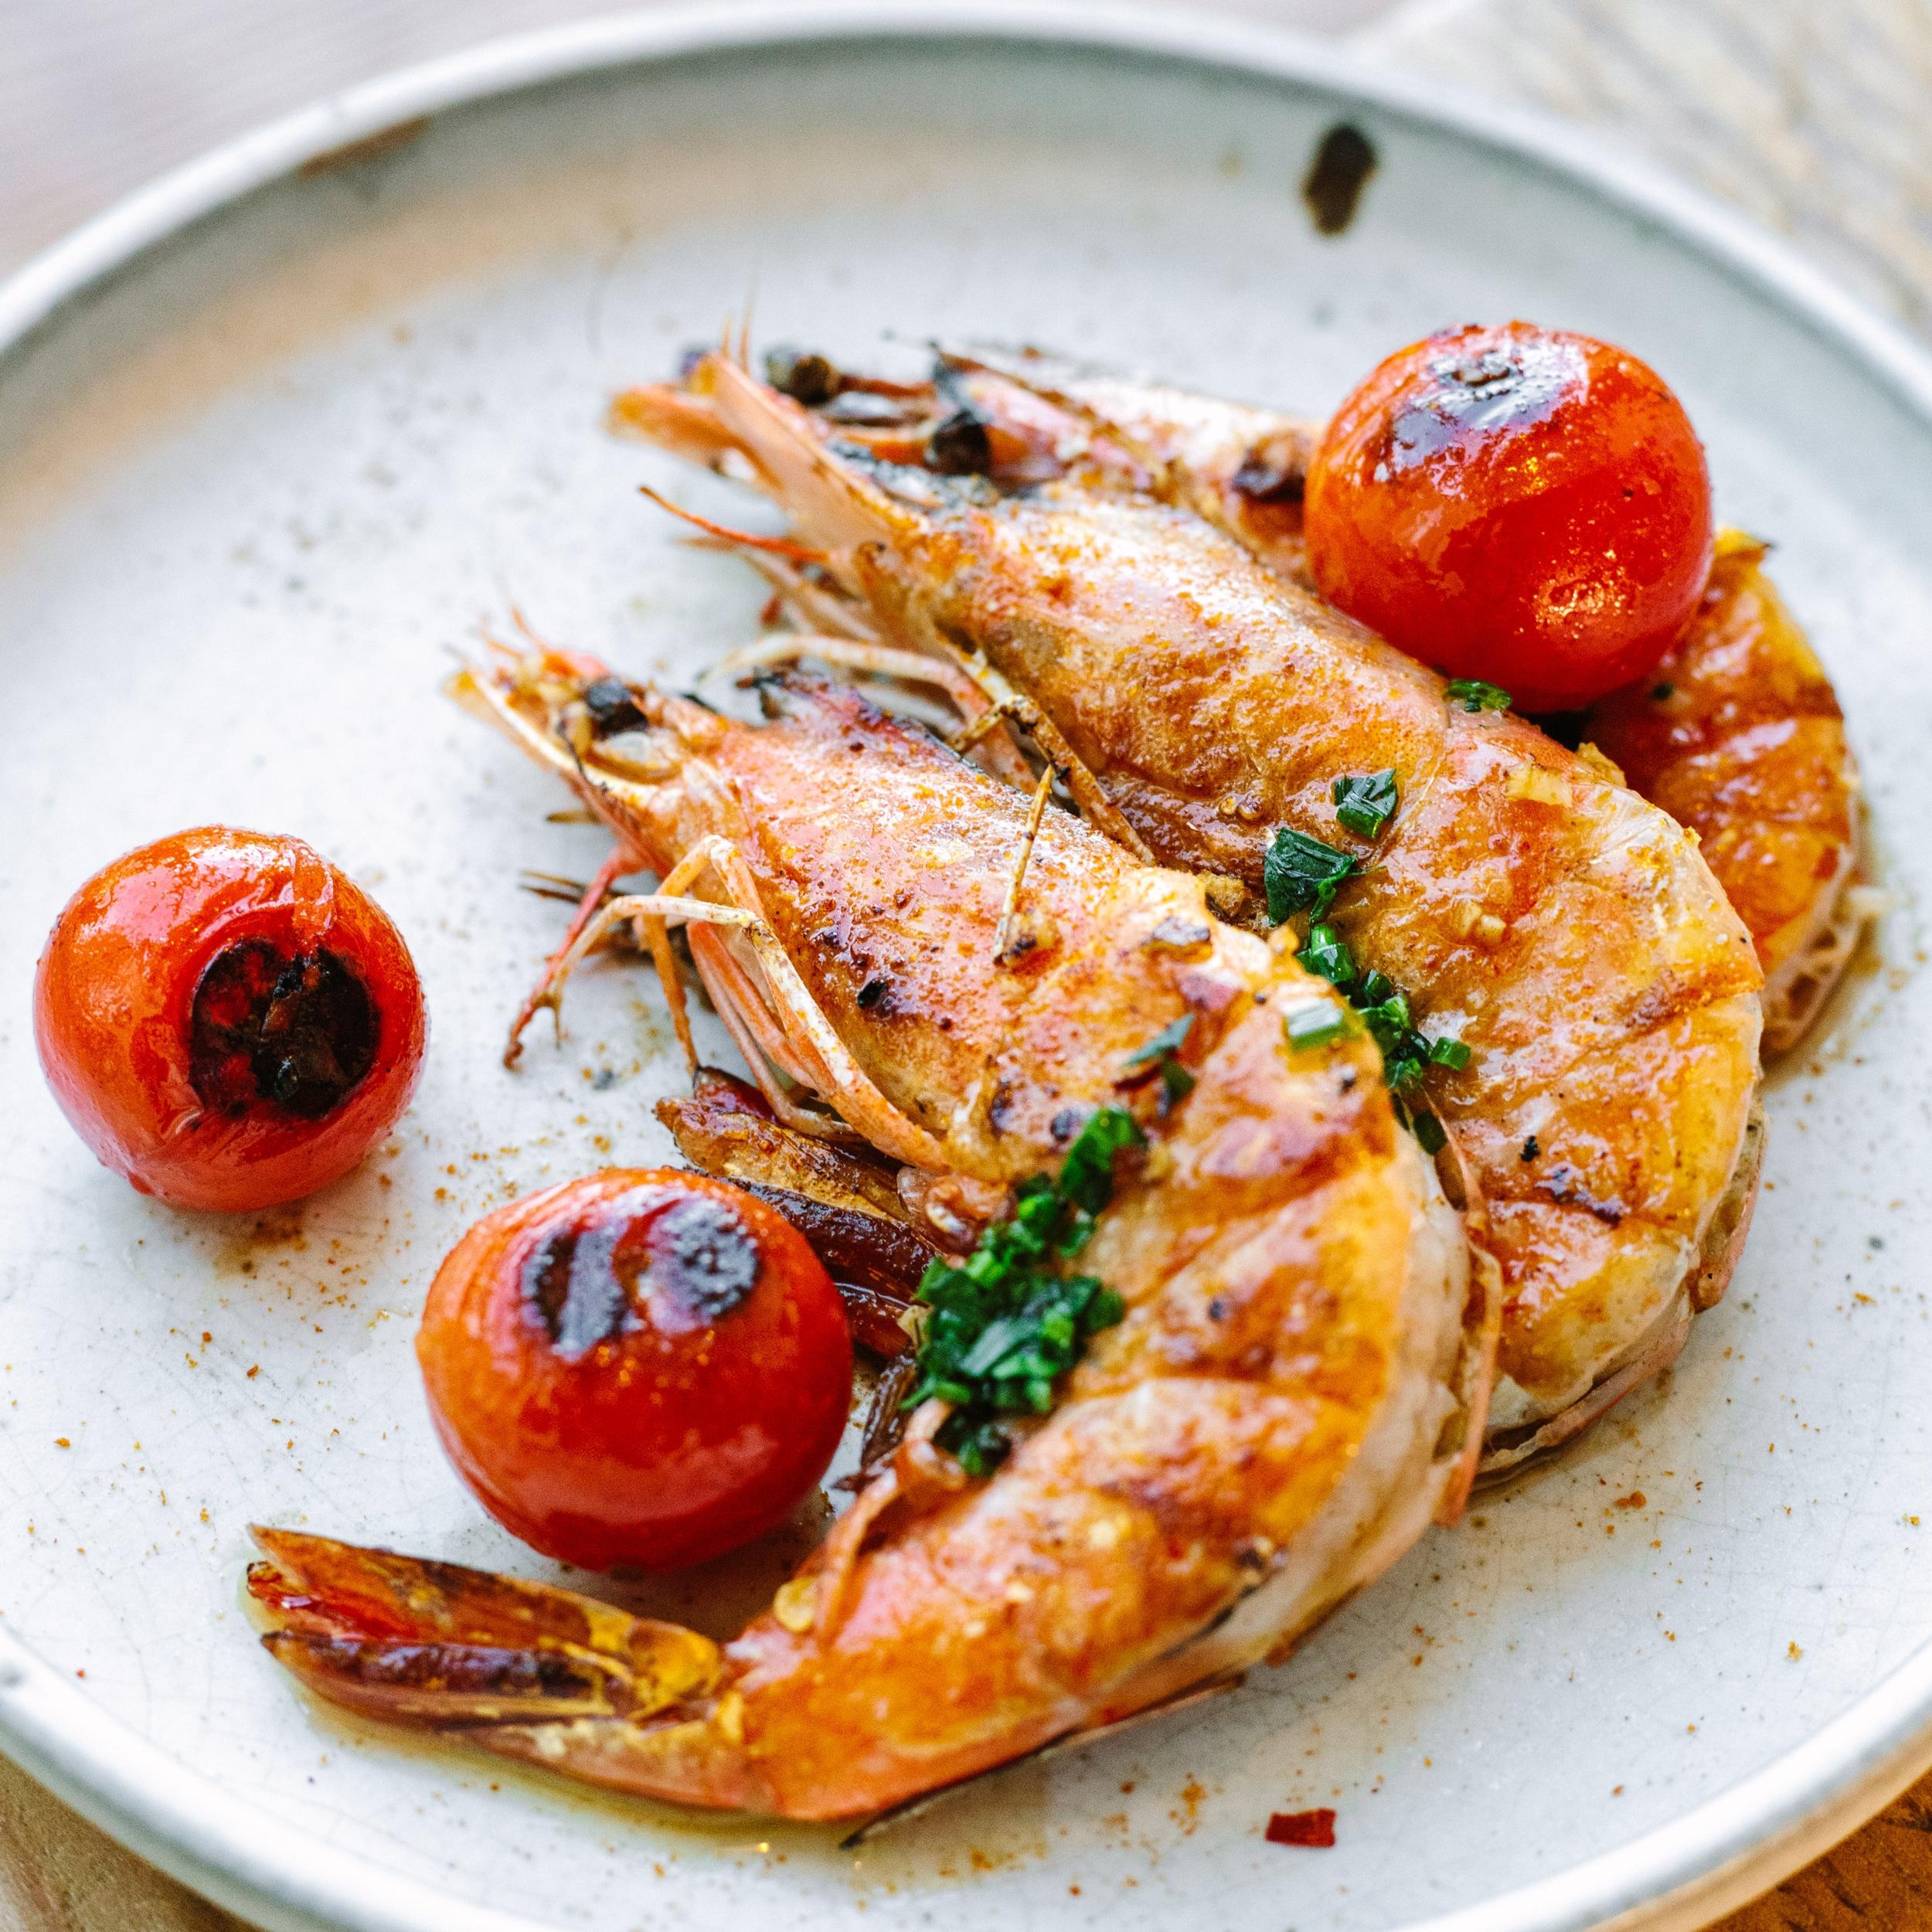 OTOÑO     - Gastronomy Blog, April 15, 2019